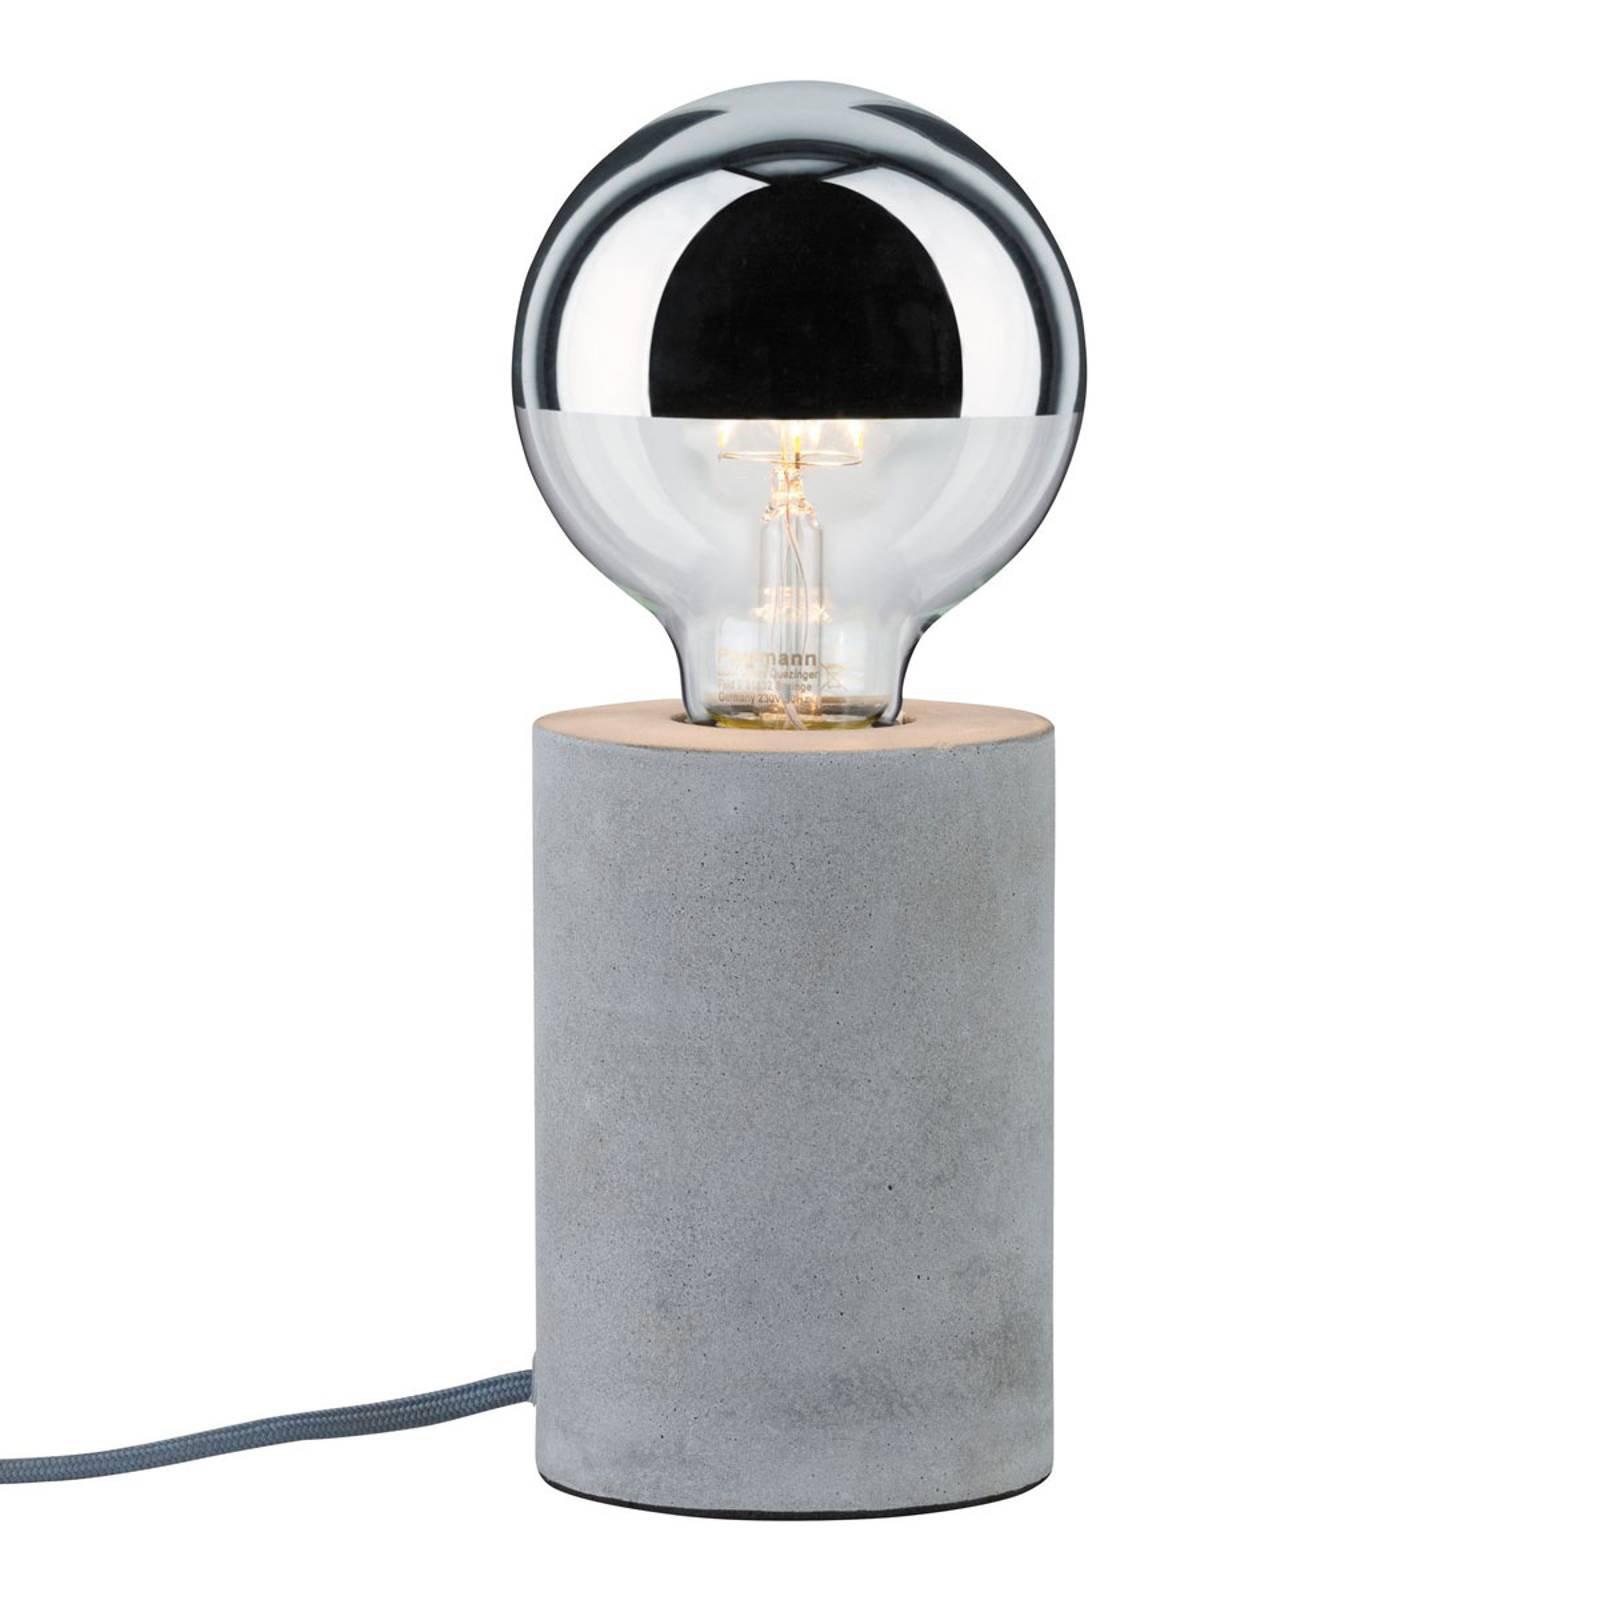 Paulmann Mik bordlampe i betong